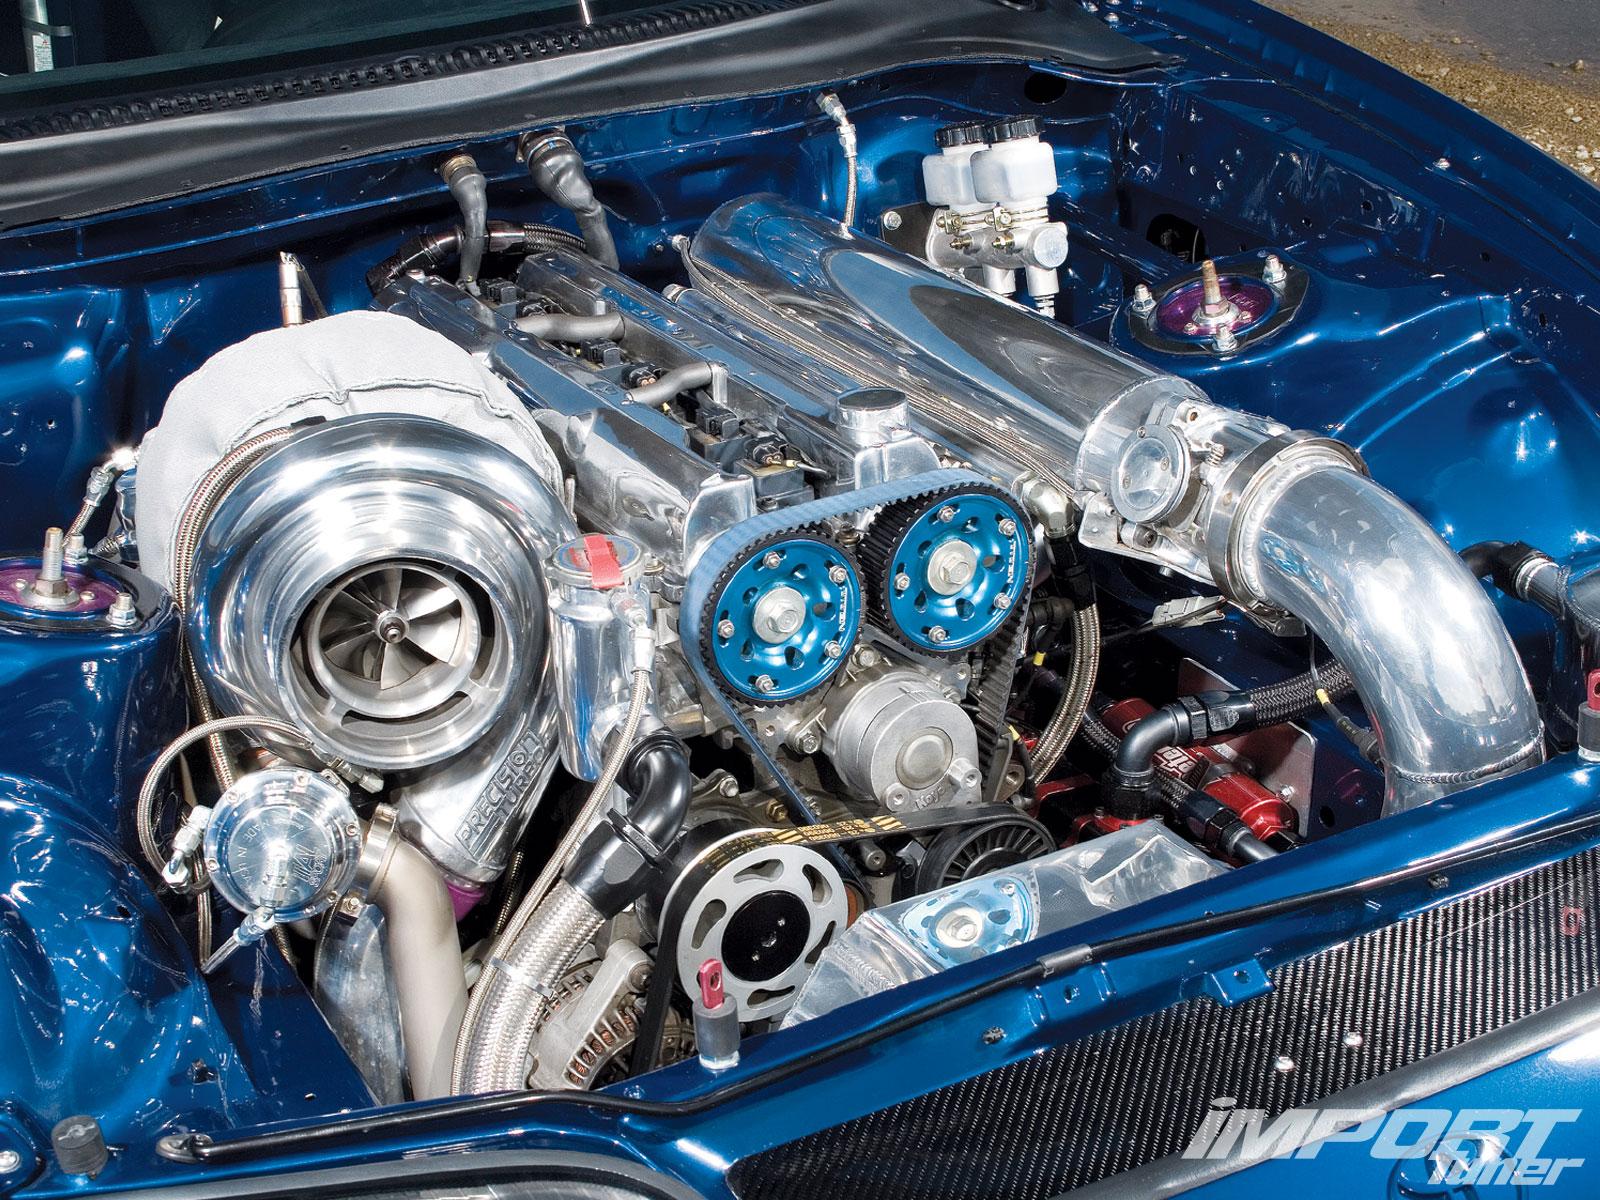 1999 Toyota Supra Engine Diagram - Wiring Diagram Services •